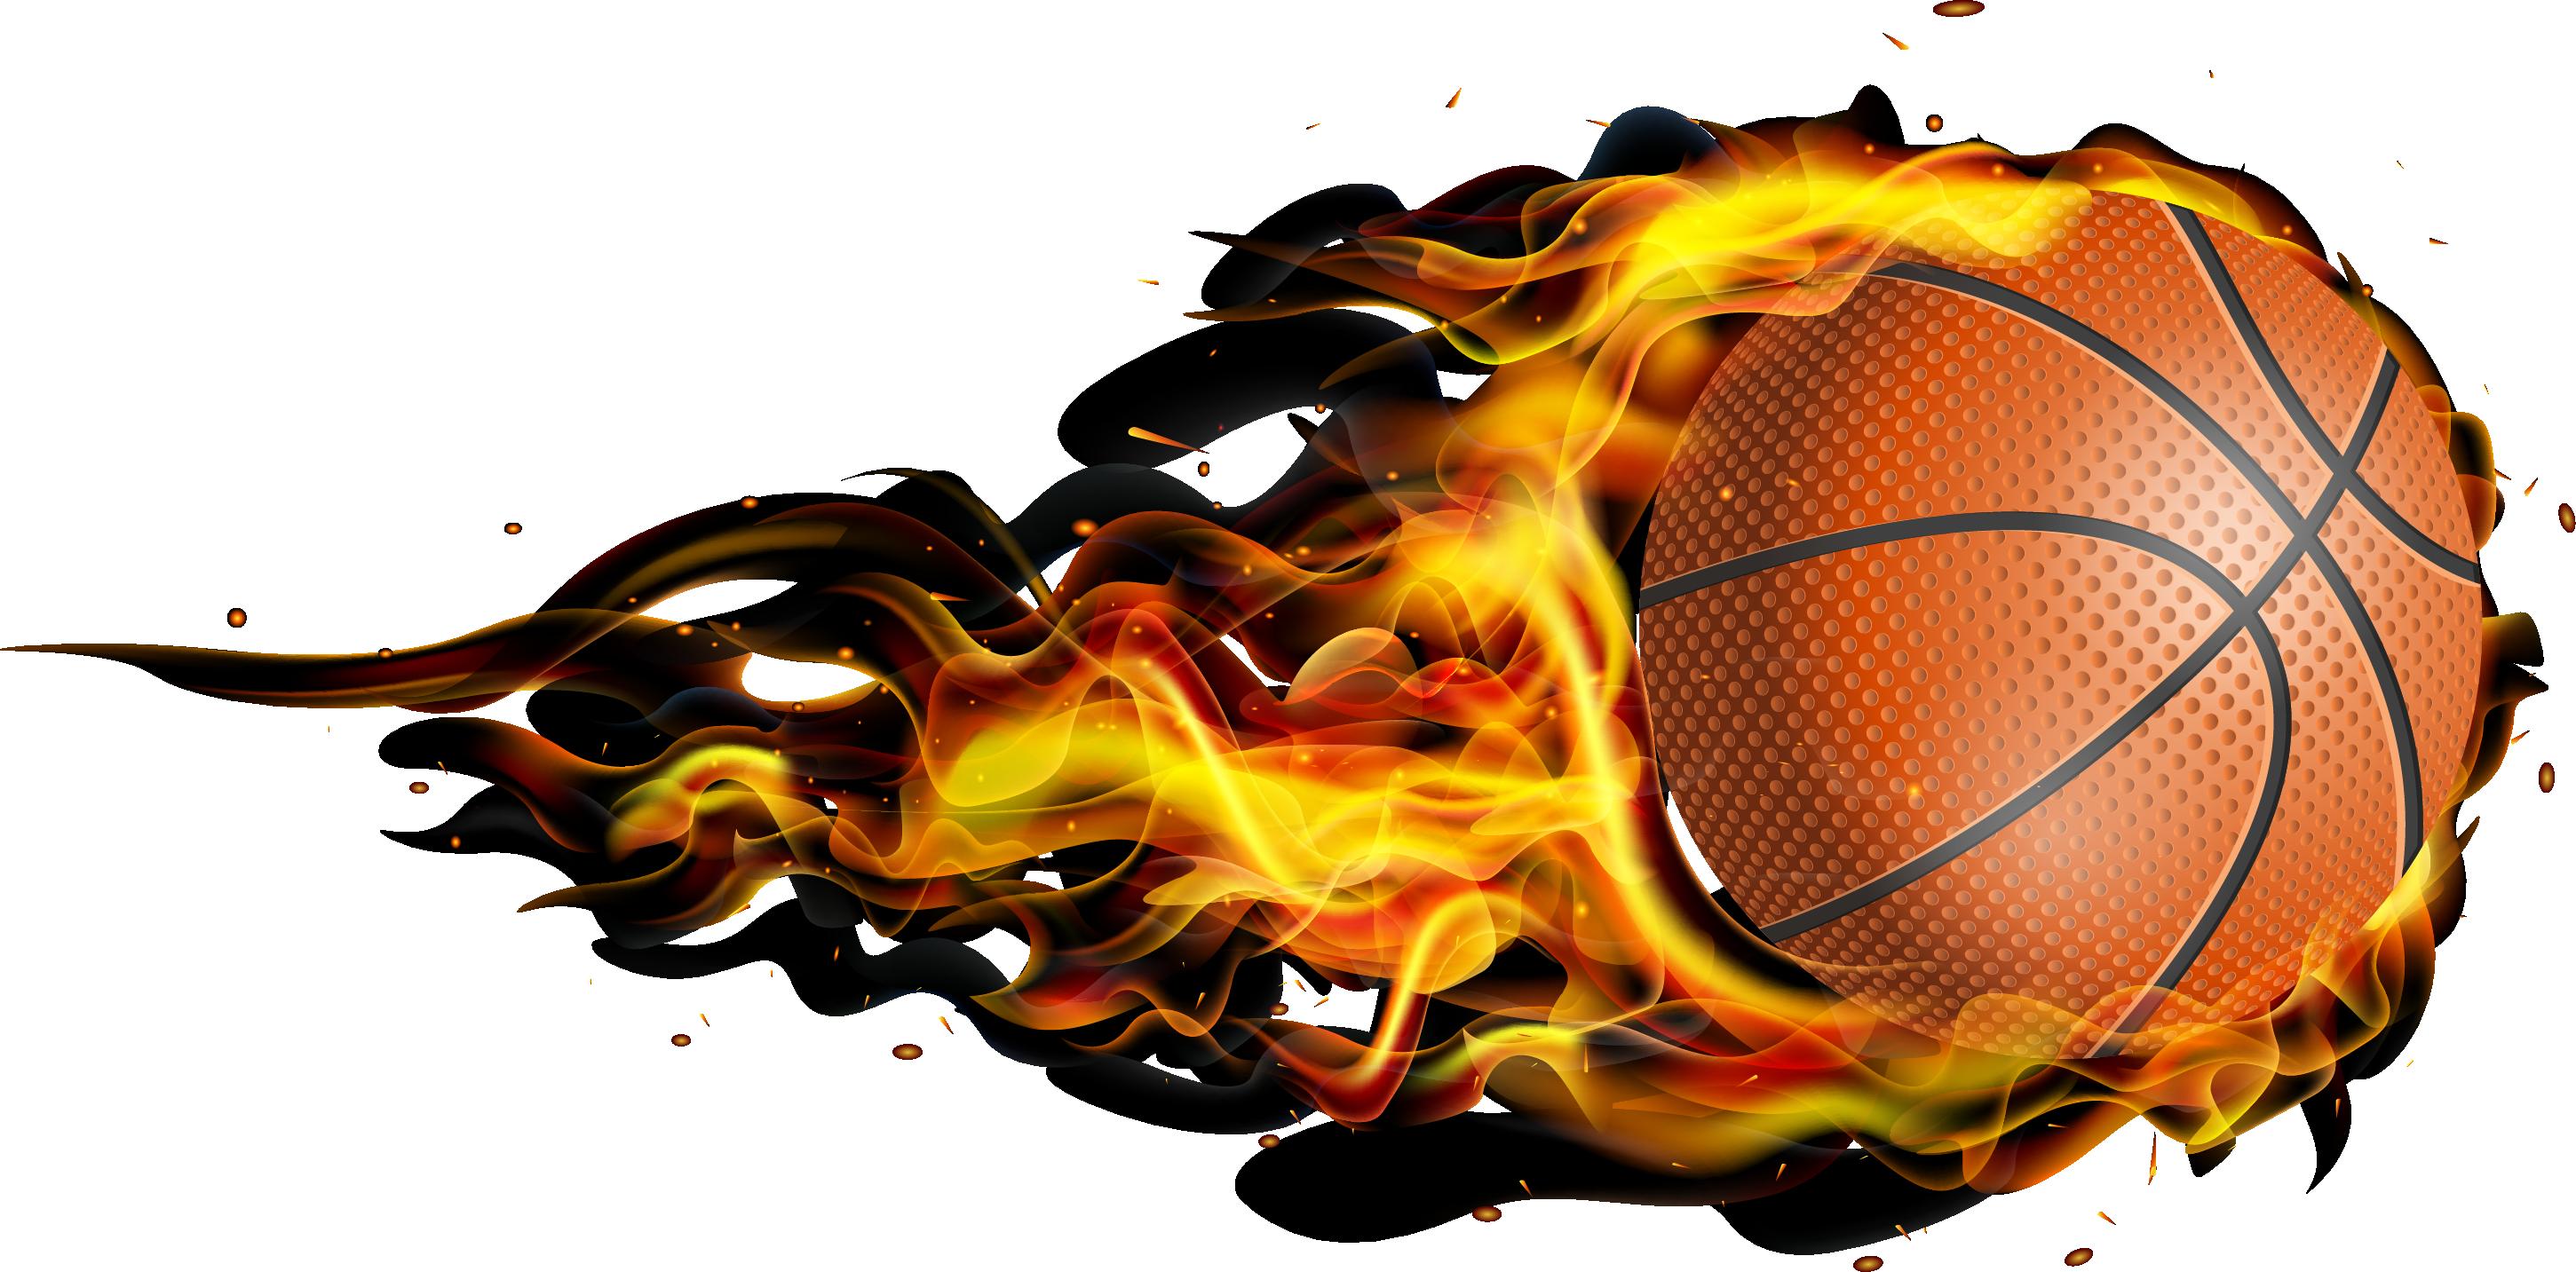 Fireball clipart flame design. Flying basketball transprent png